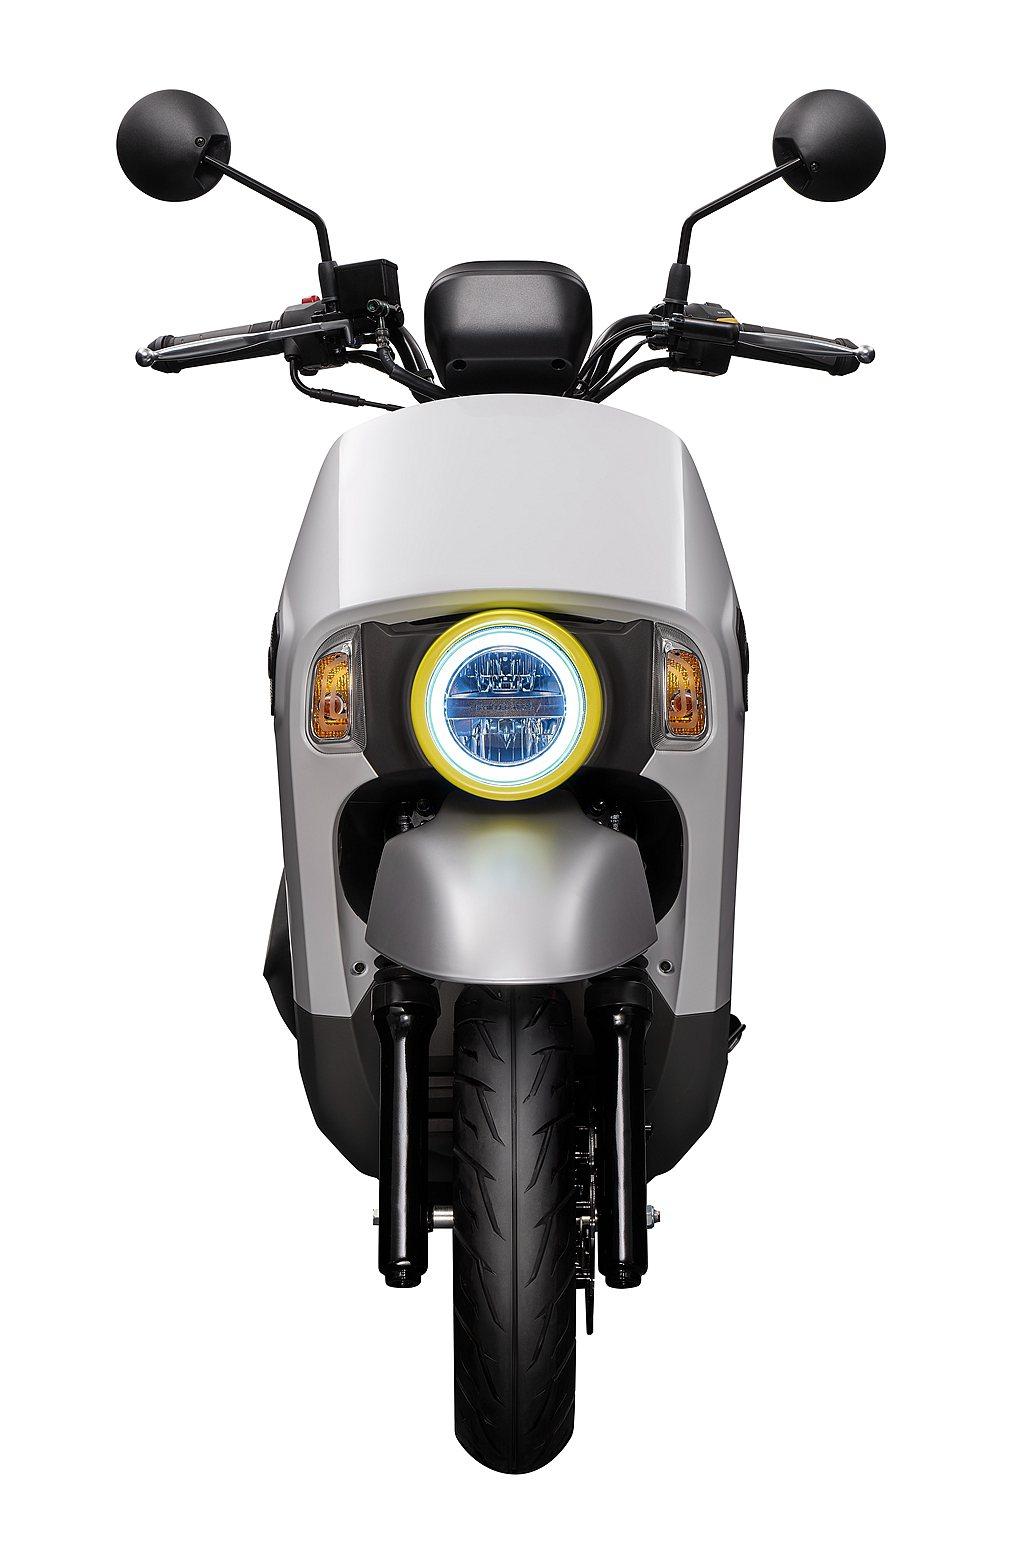 SYM 4MICA導入Class D汽車級LED頭燈,採用日行燈、遠近燈整合設計...